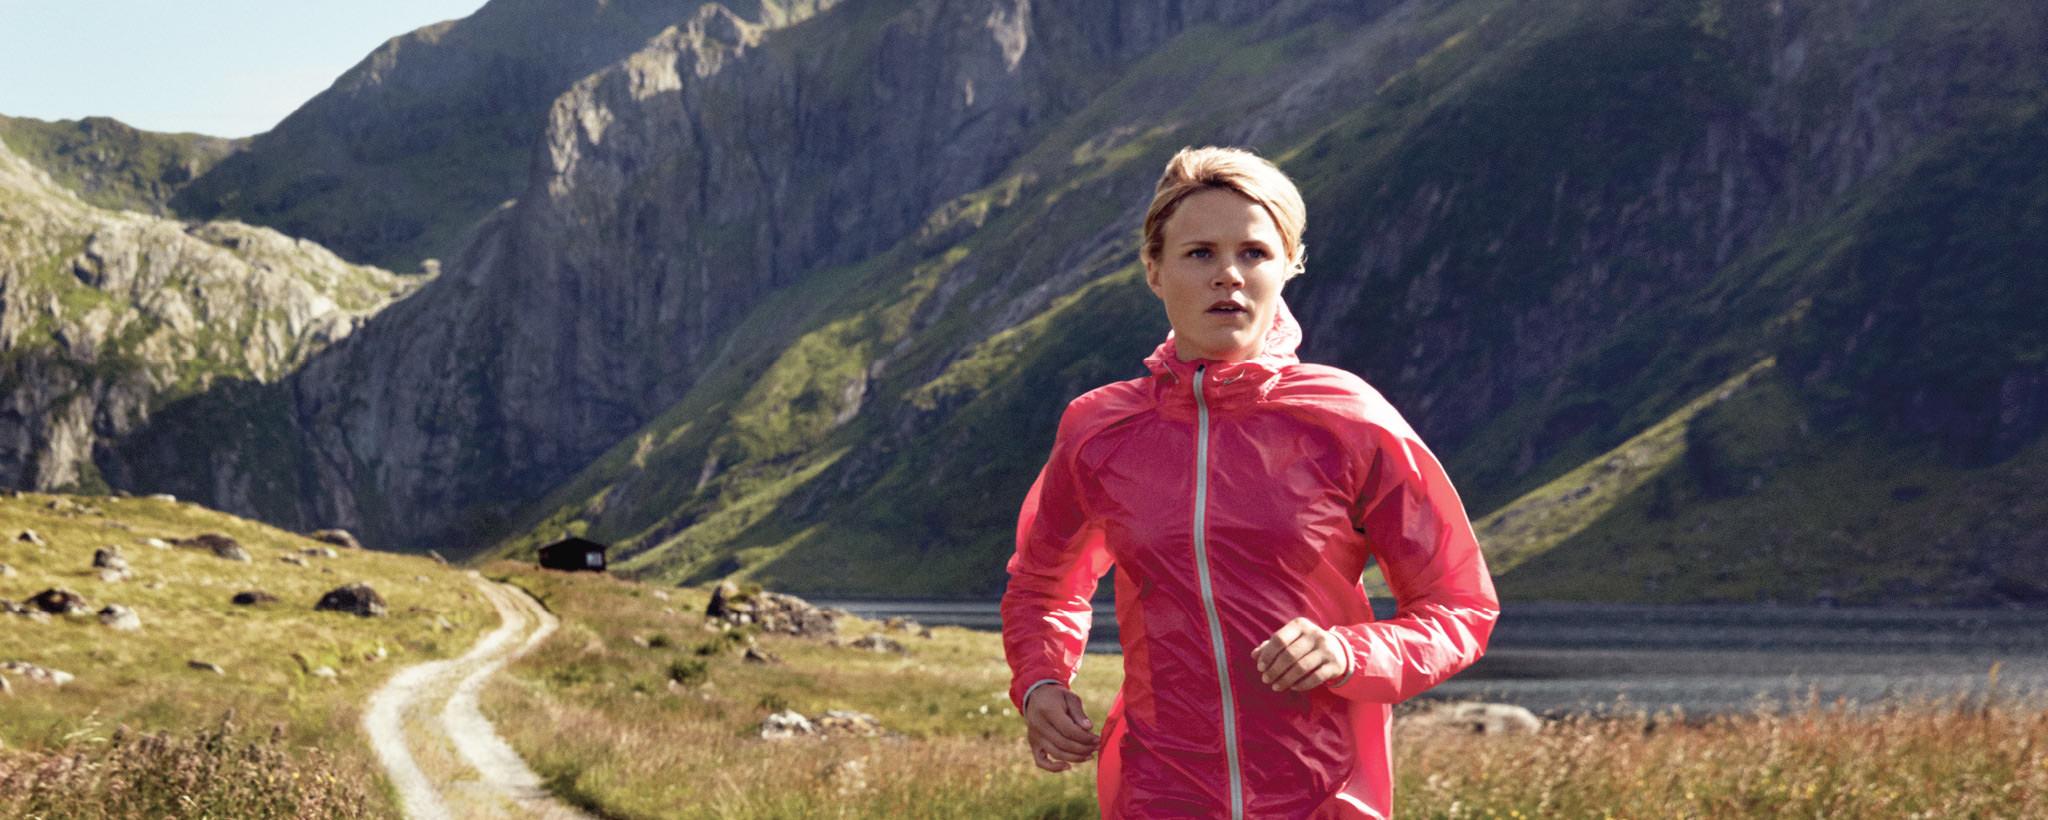 Lady running in Helly Hansen clothing